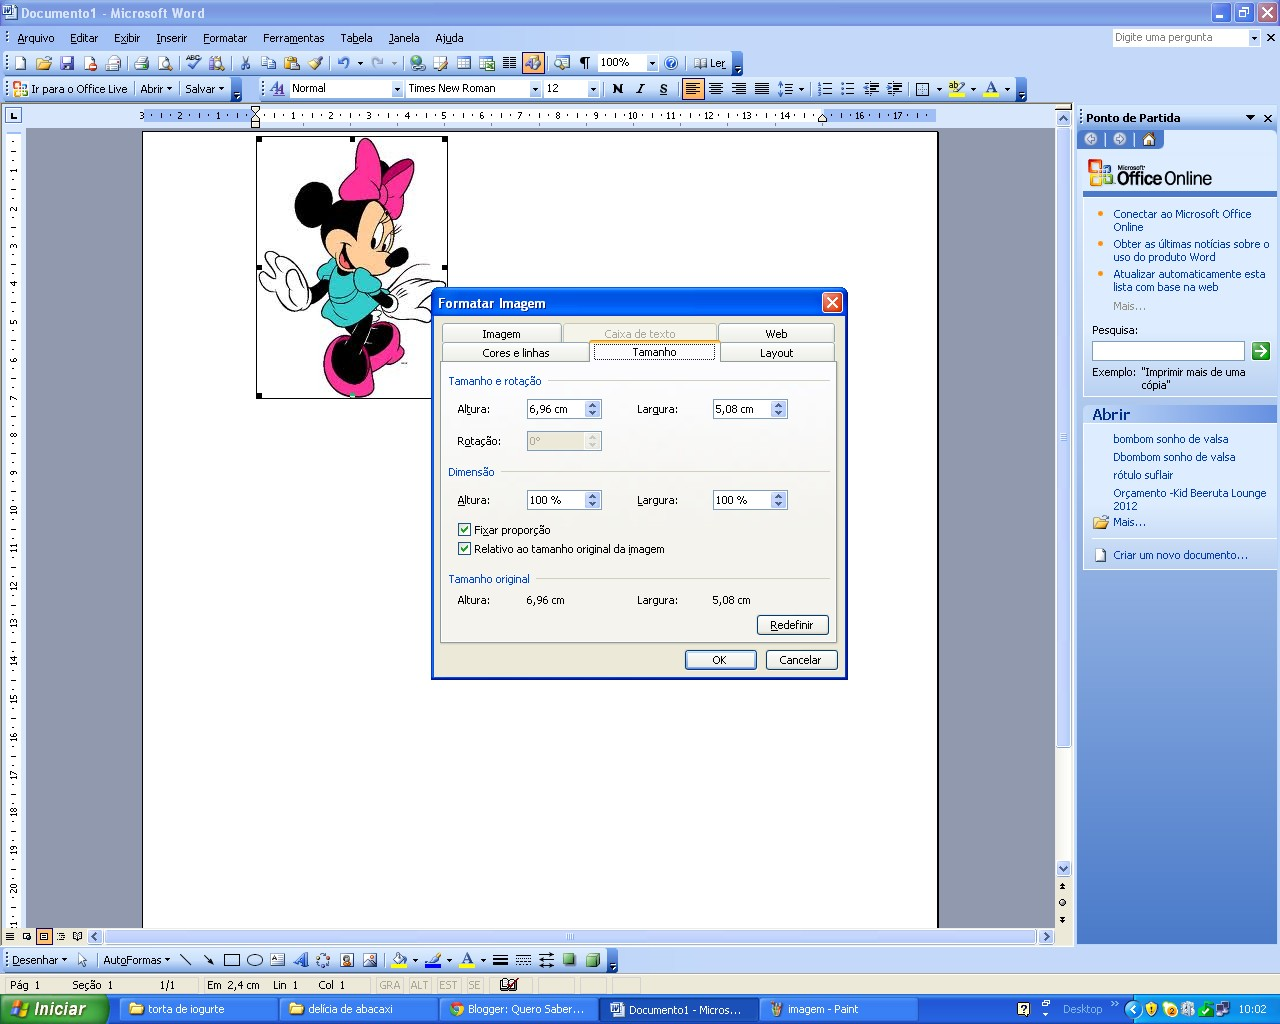 Programa ampliar fotos digitais 35